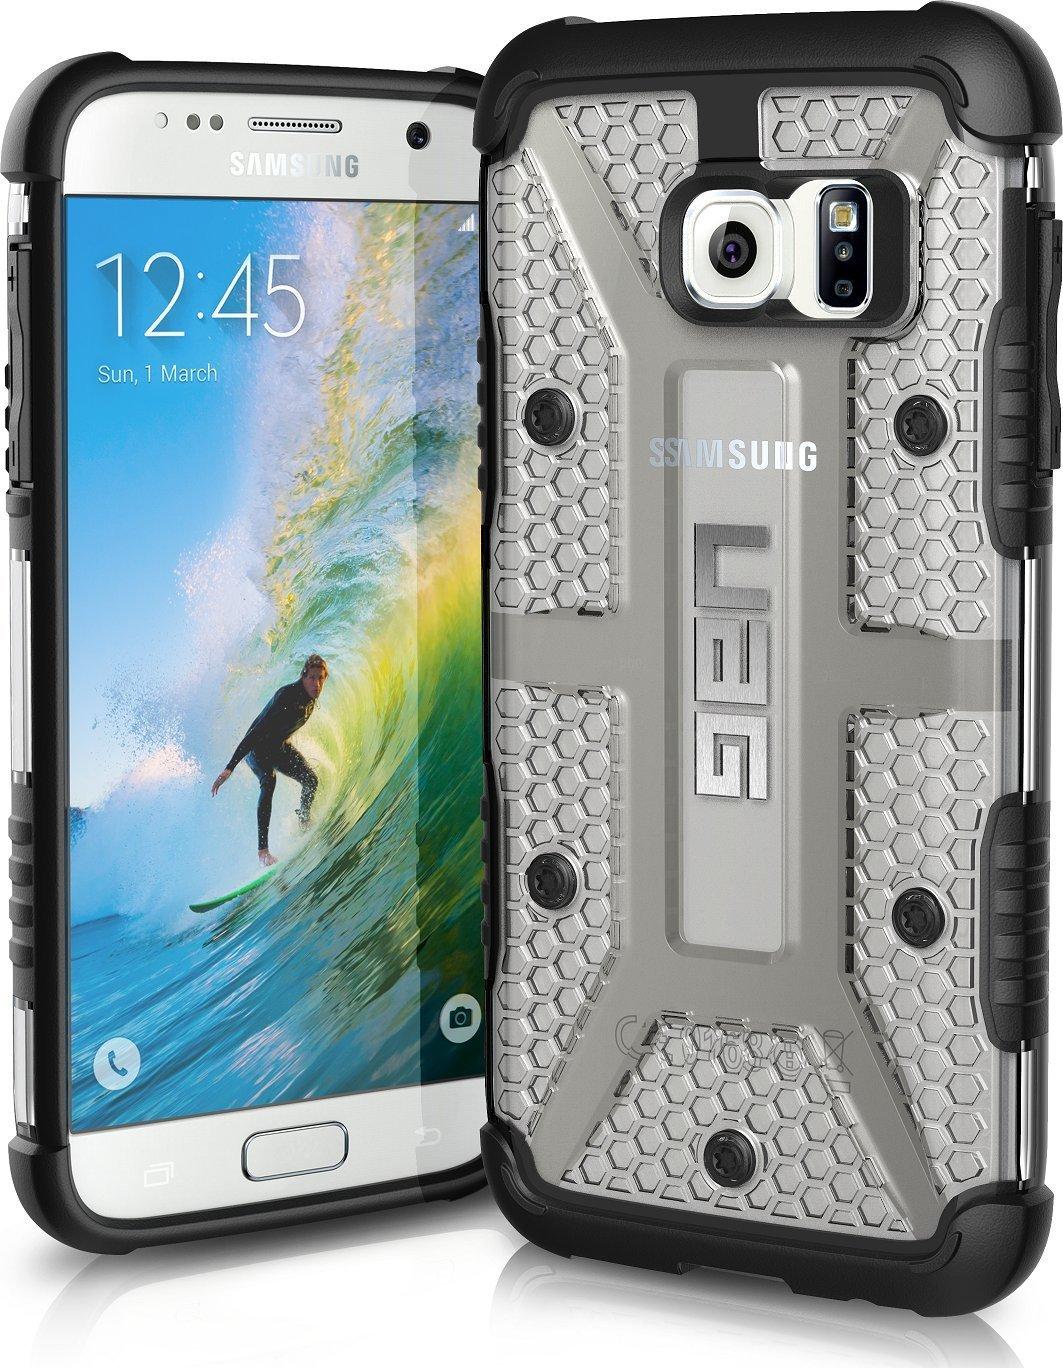 UAG Θήκη Feather-Light Composite Samsung Galaxy S7 - Ice/Black (8757)